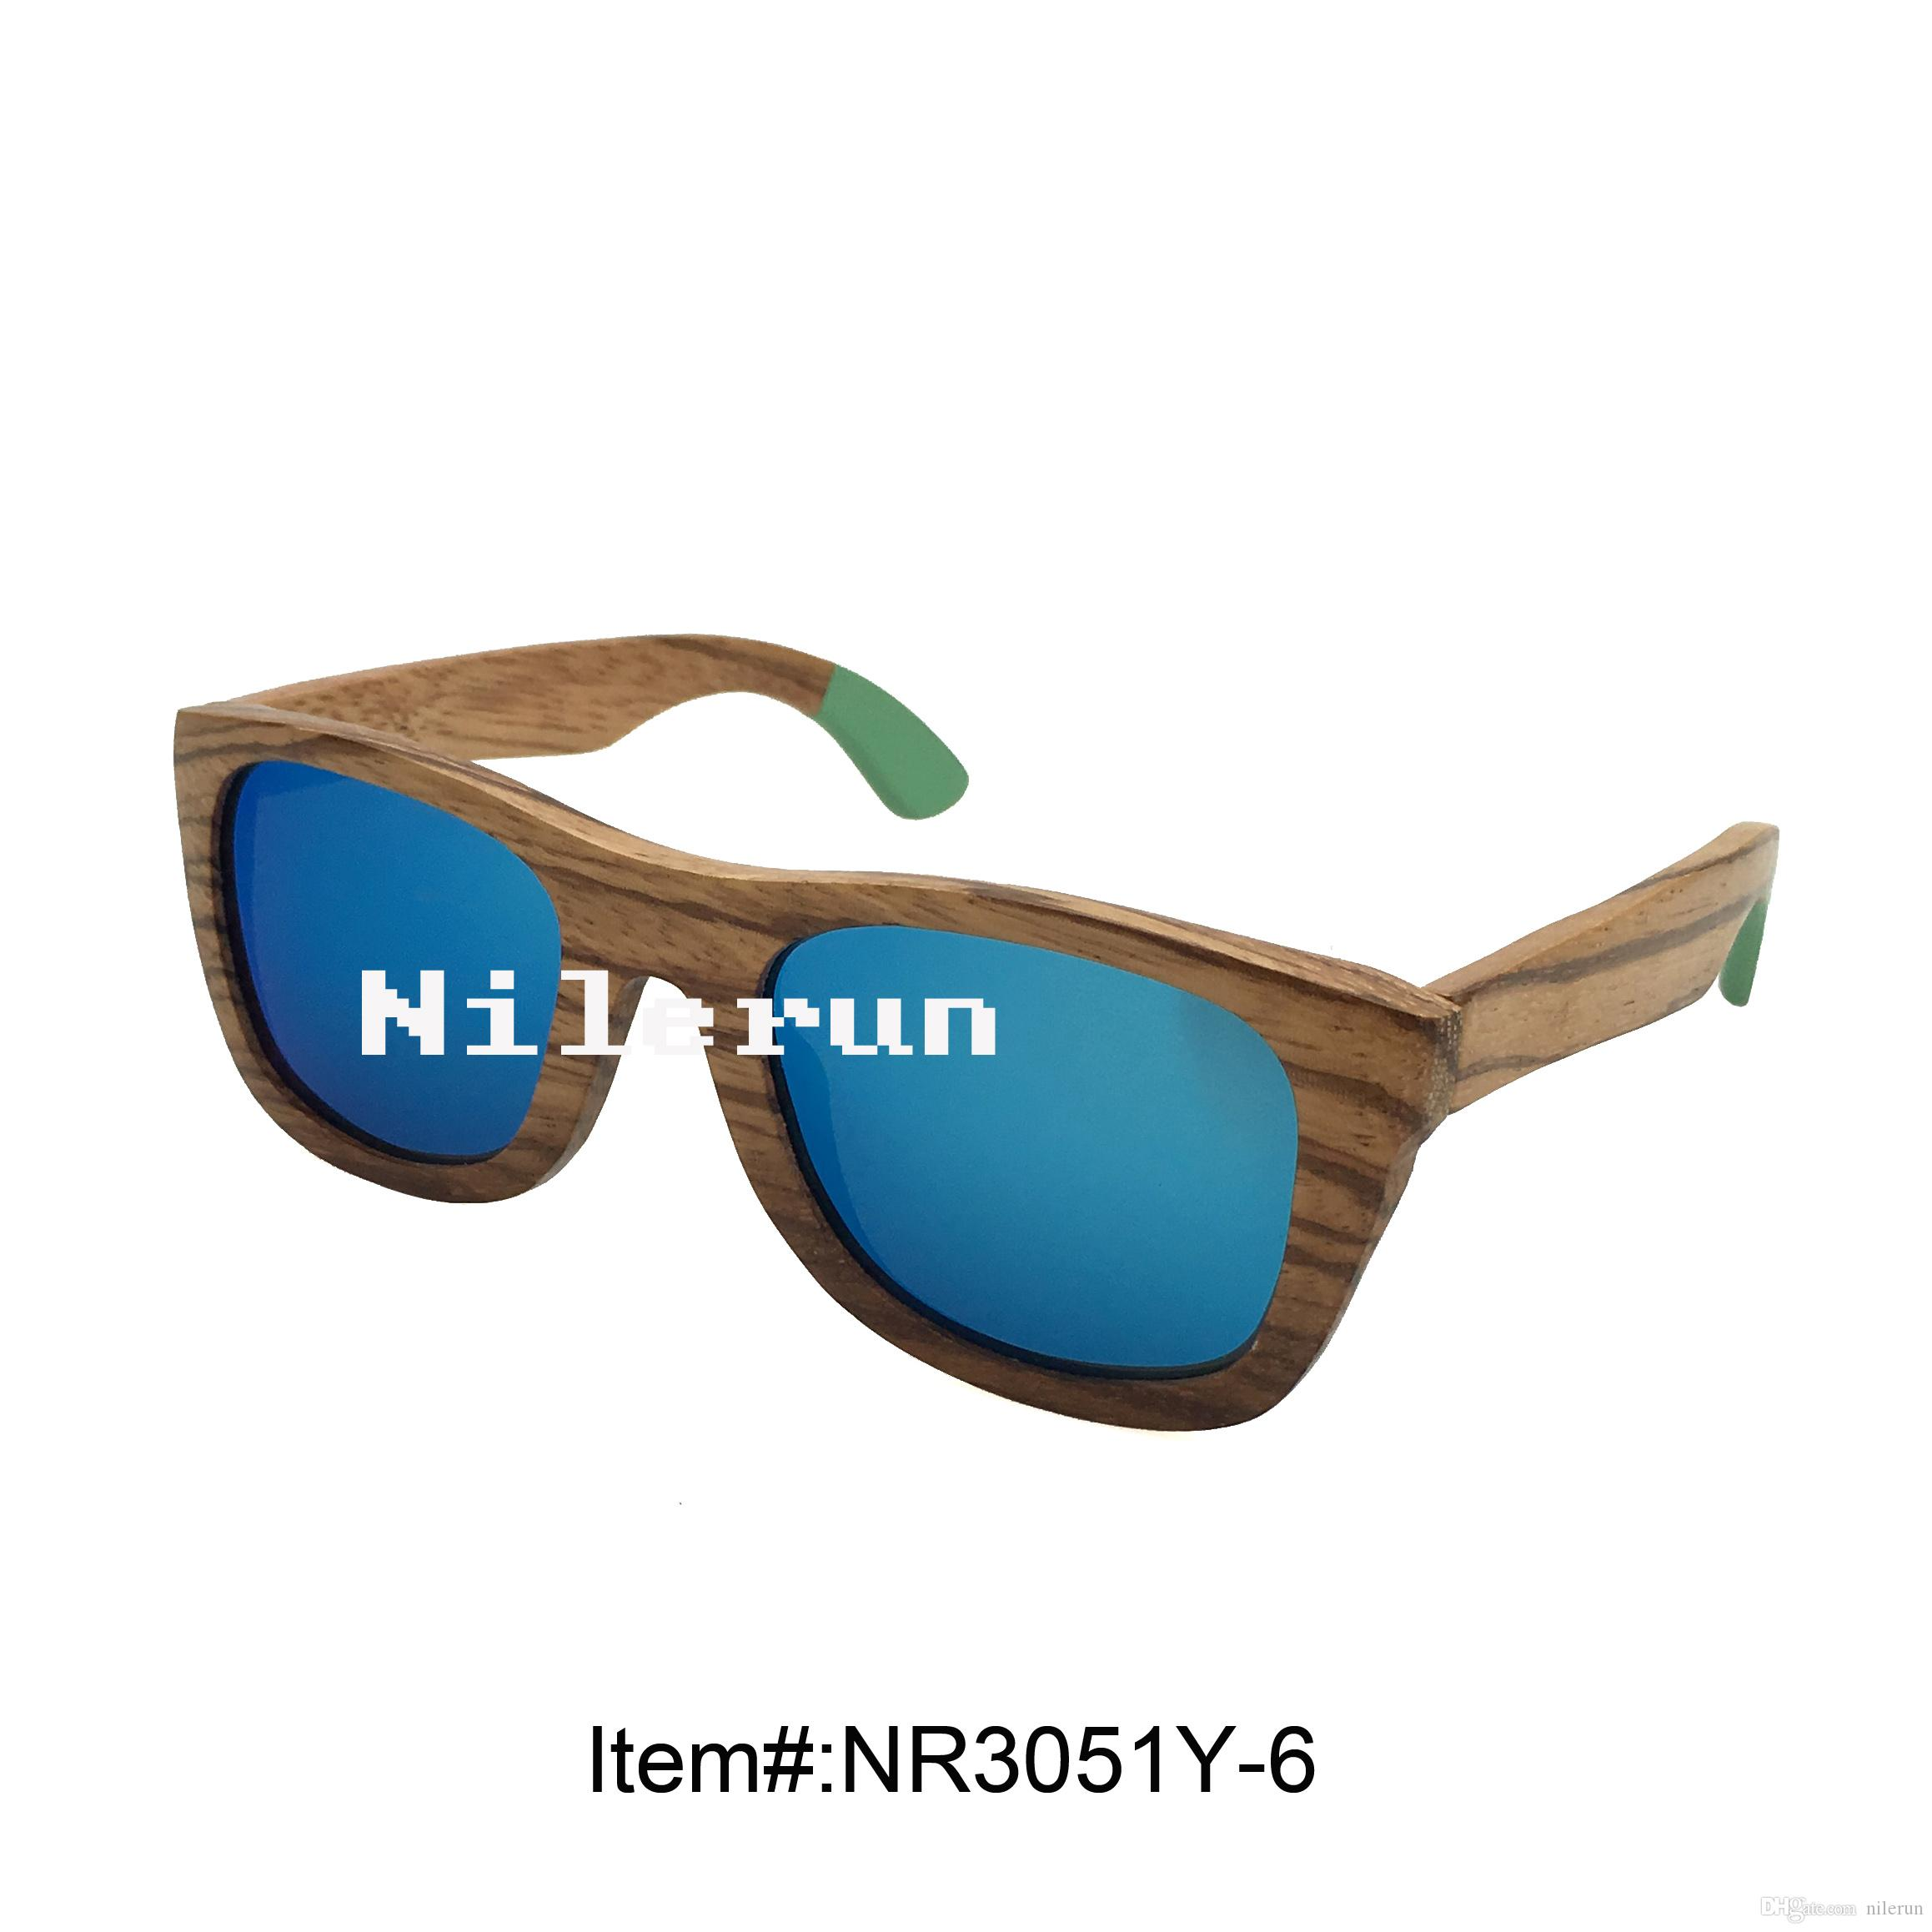 8e20266e10 Fashion Blue Polarized Mirror Lens Zebra Wood Sunglasses with Green ...